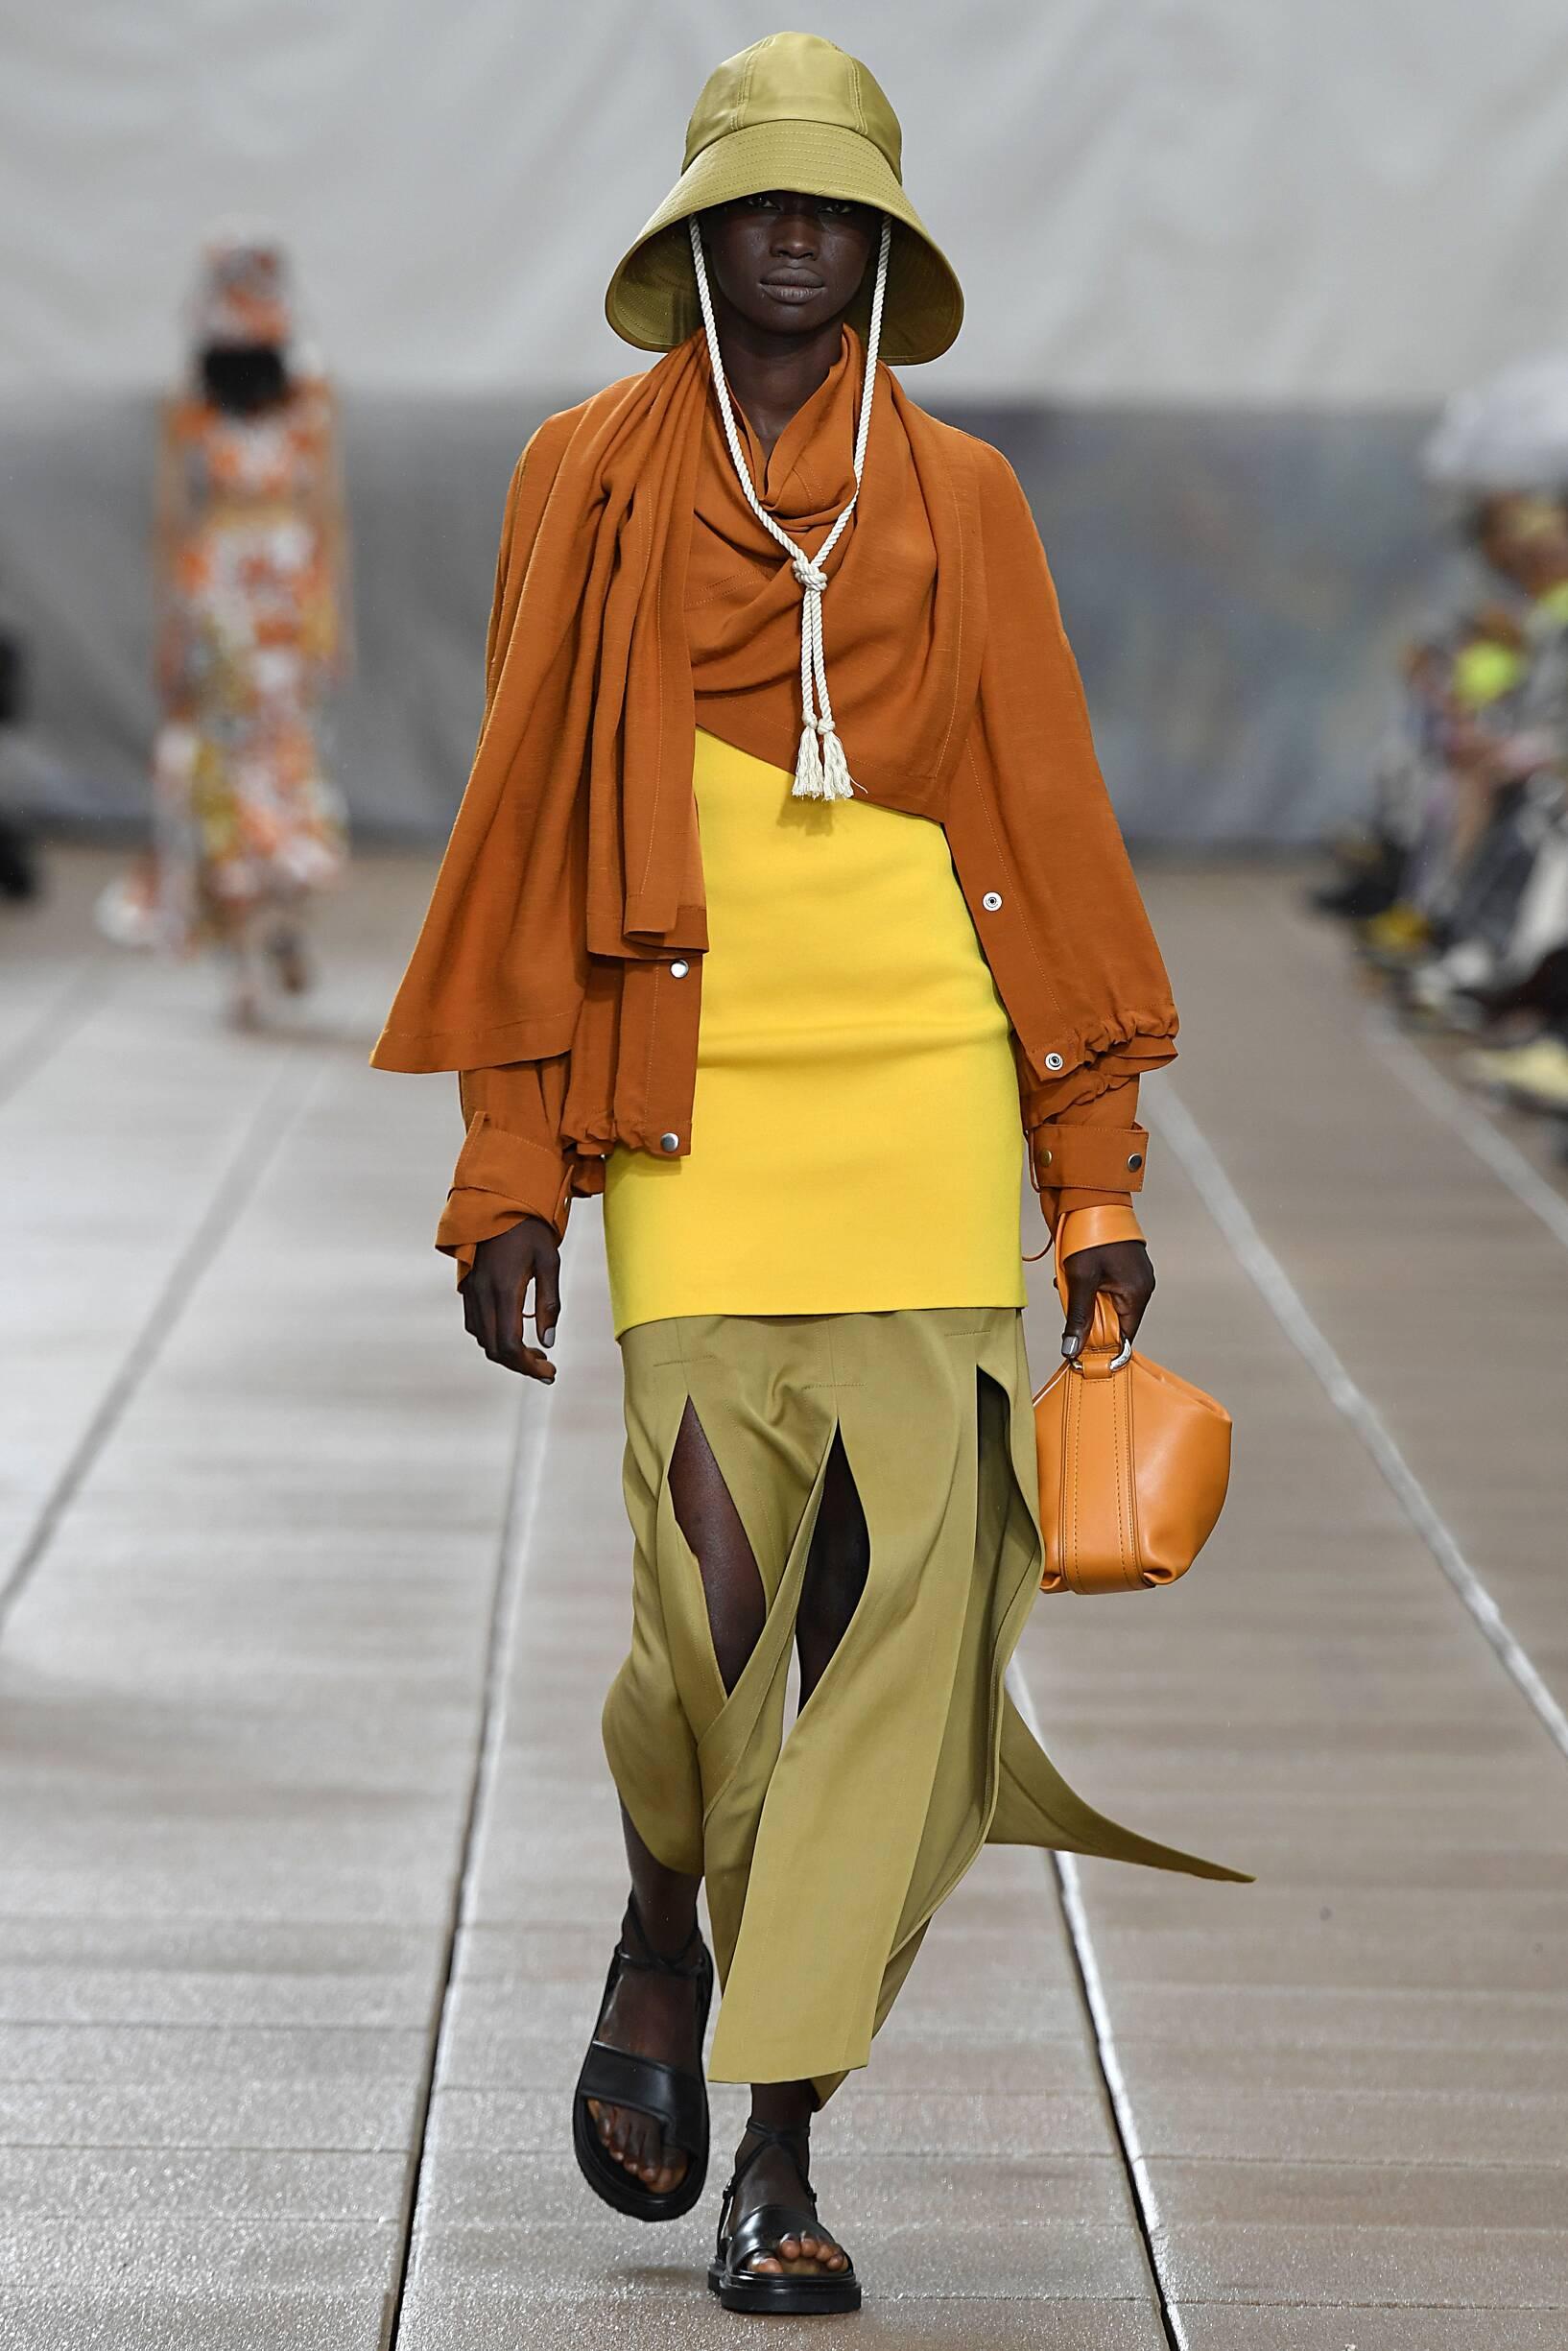 SS 2019 3.1 Phillip Lim Fashion Show New York